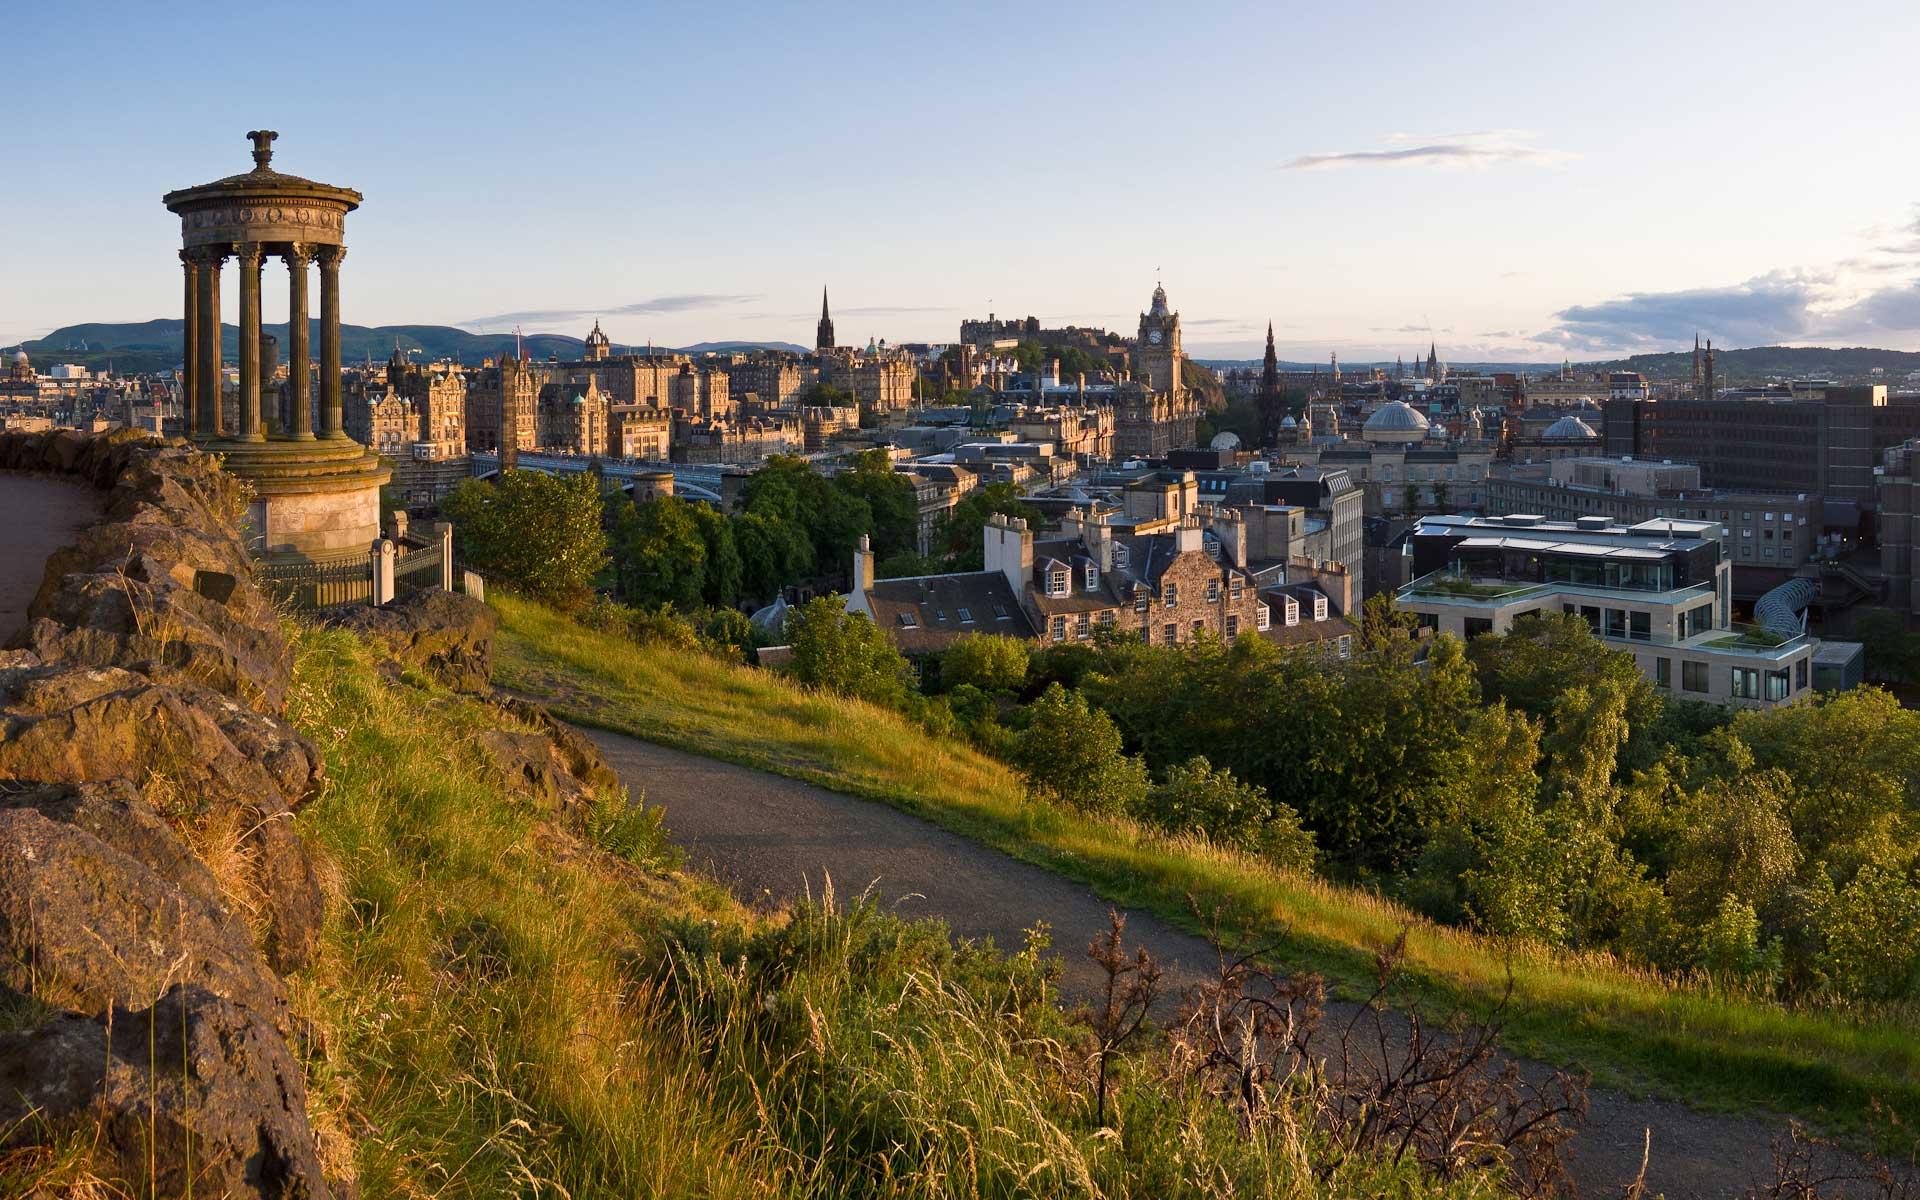 Crédito foto: http://colin.barschel.net/gallery/v/Edinburgh/Edinburgh+from+Calton+Hill.jpg.html